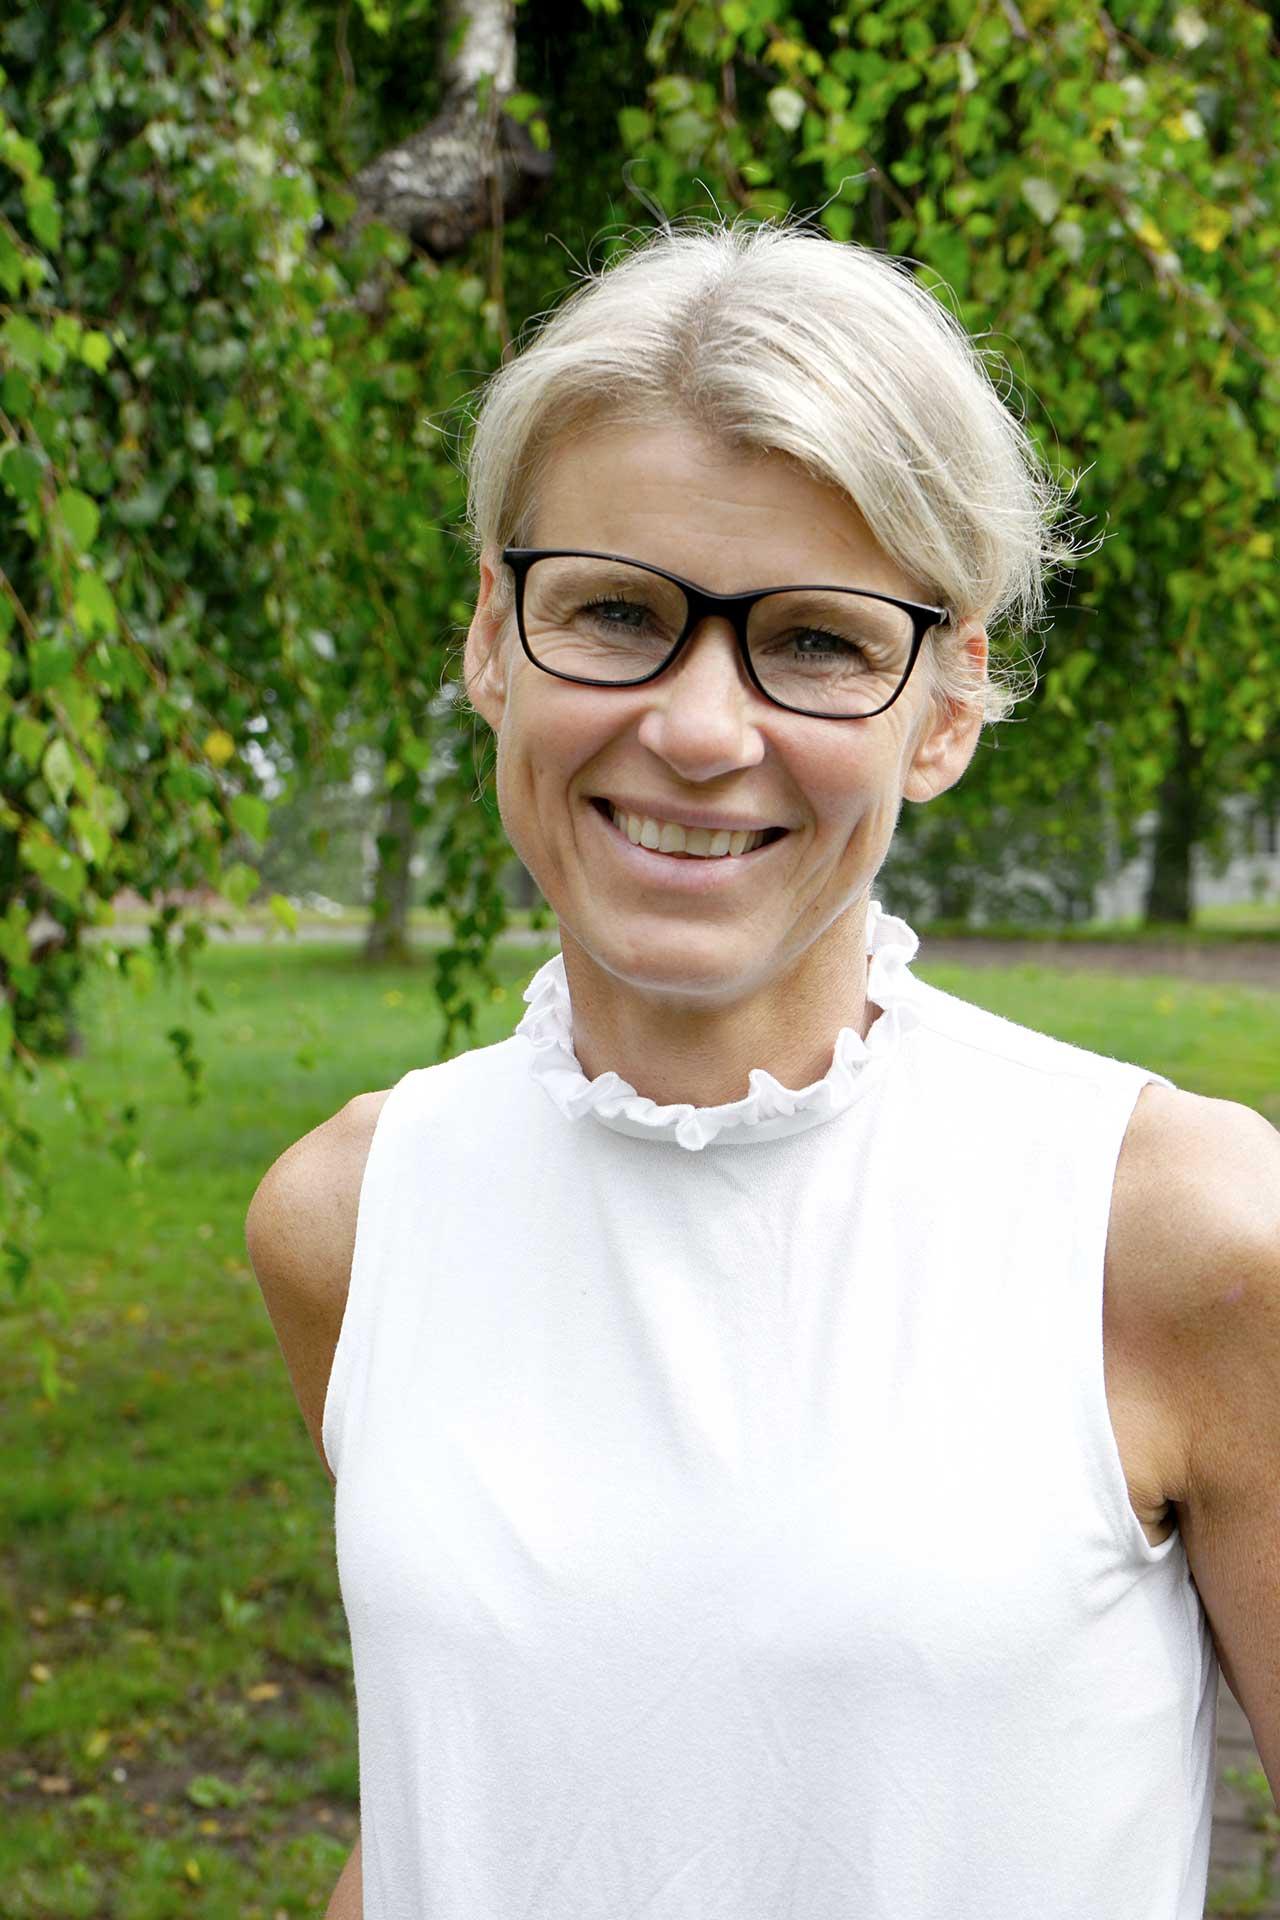 Anna-Lena Thoursie, kurator på Svf